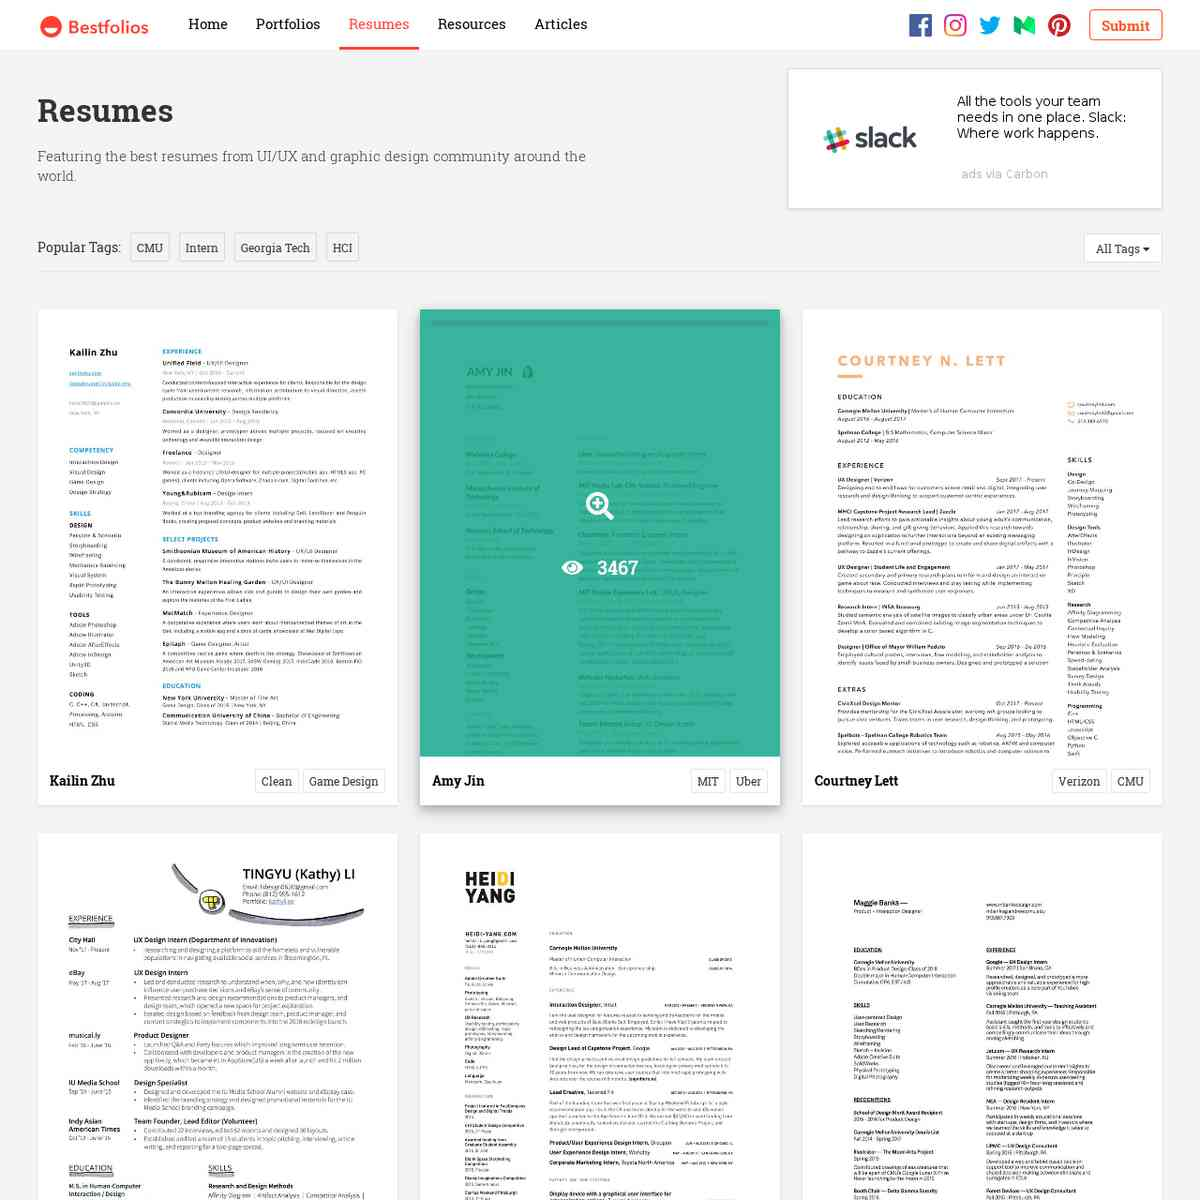 Bestfolios - UI/UX Design Portfolio Inspiration and Showcase